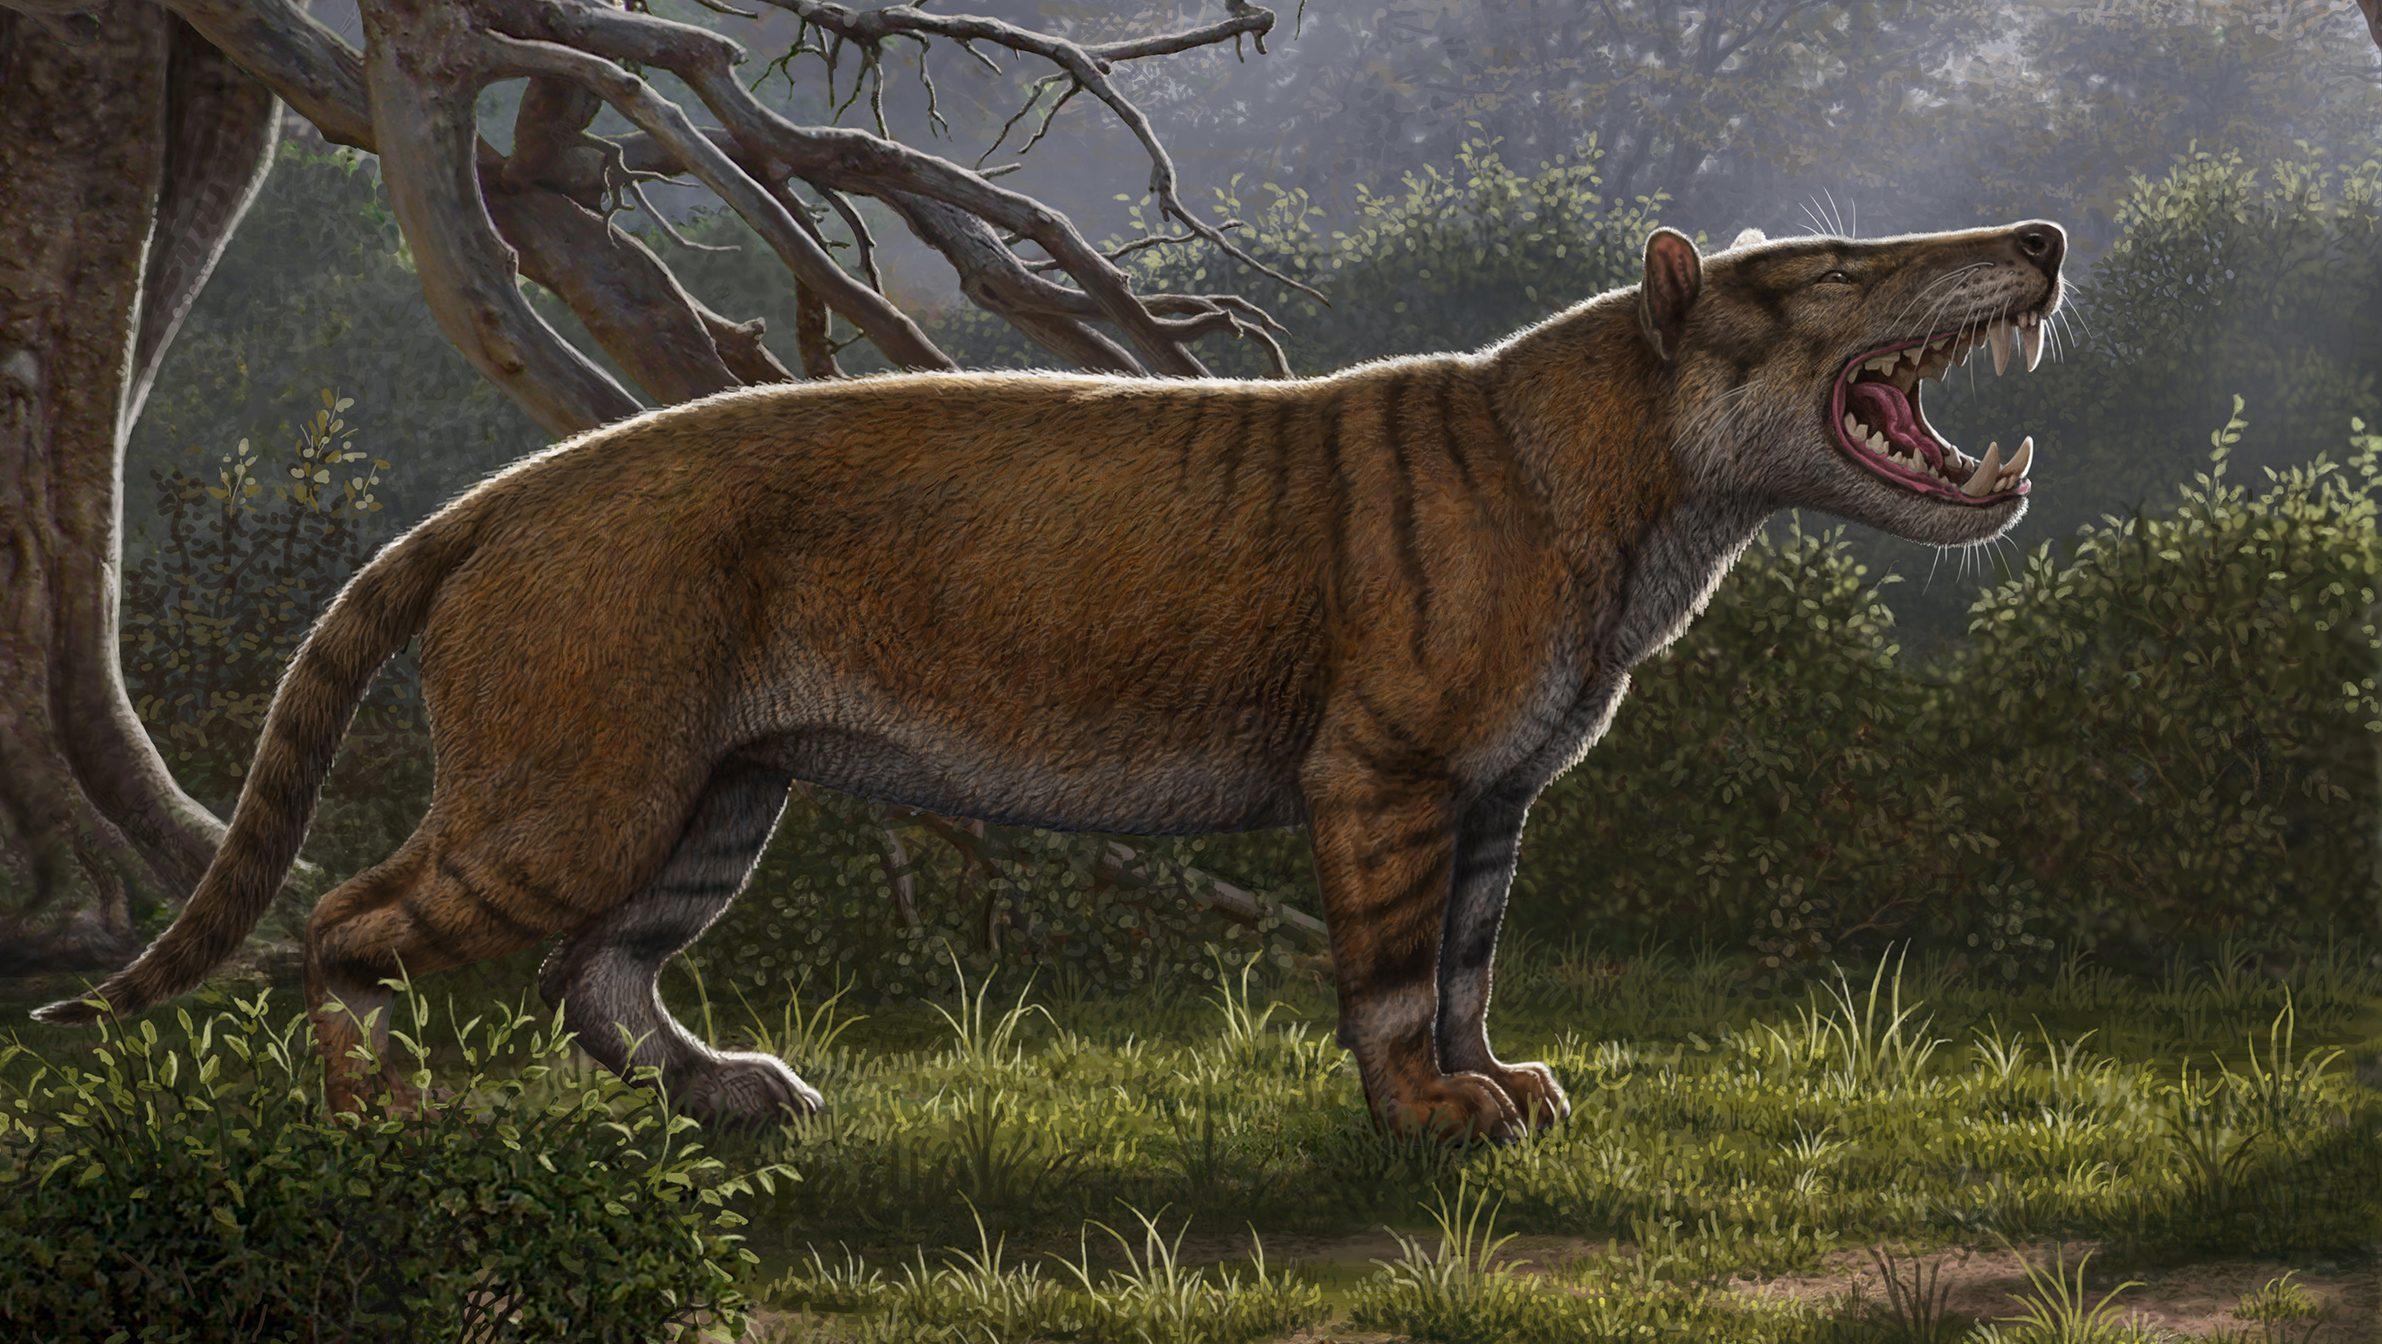 'Big lion' fossil found in Kenya museum drawer